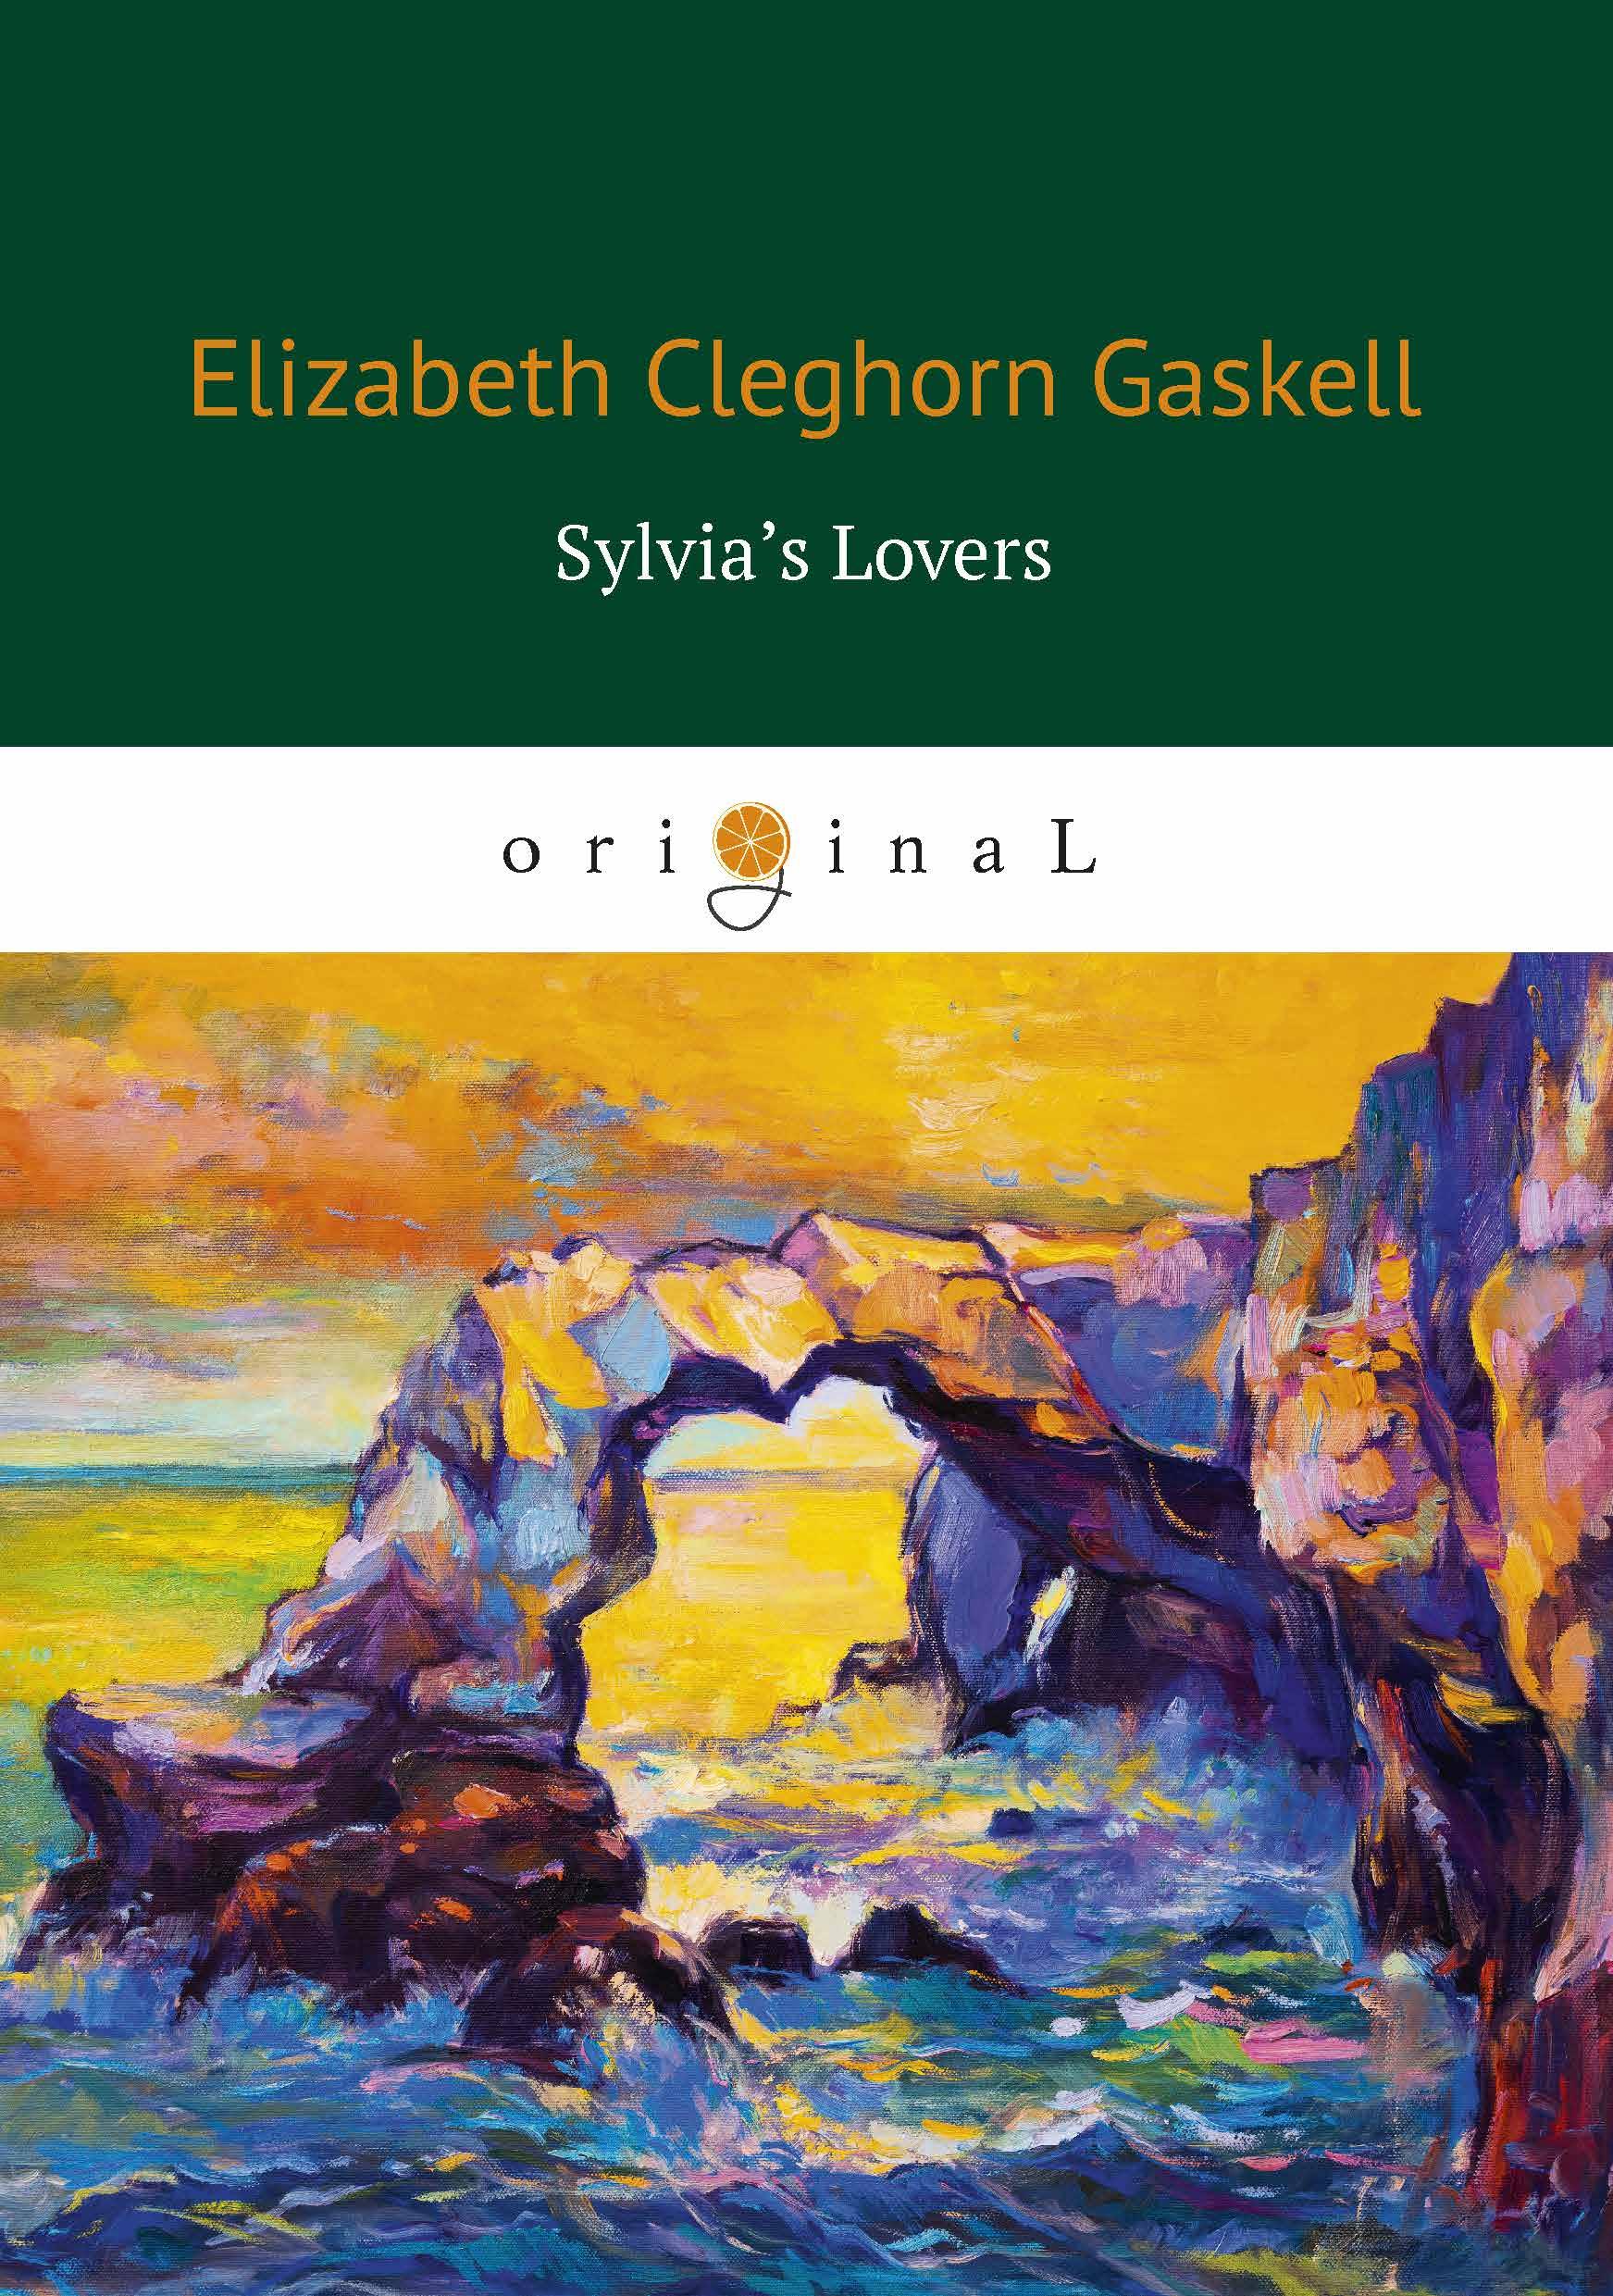 Elizabeth Cleghorn Gaskell Sylvia's Lovers the lovers